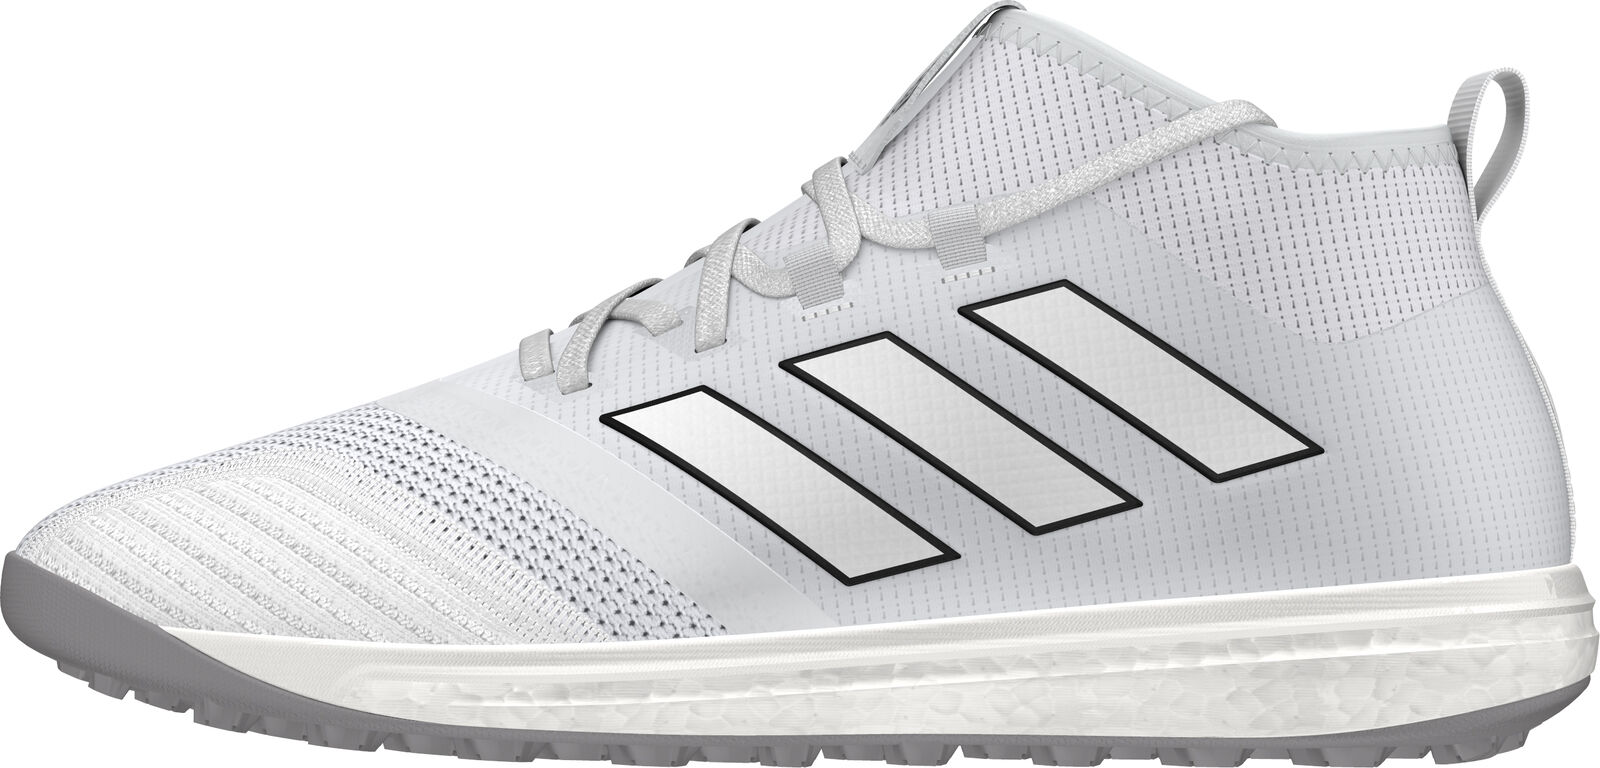 Adidas Ace Tango 17.1 Mens Football Trainers - White